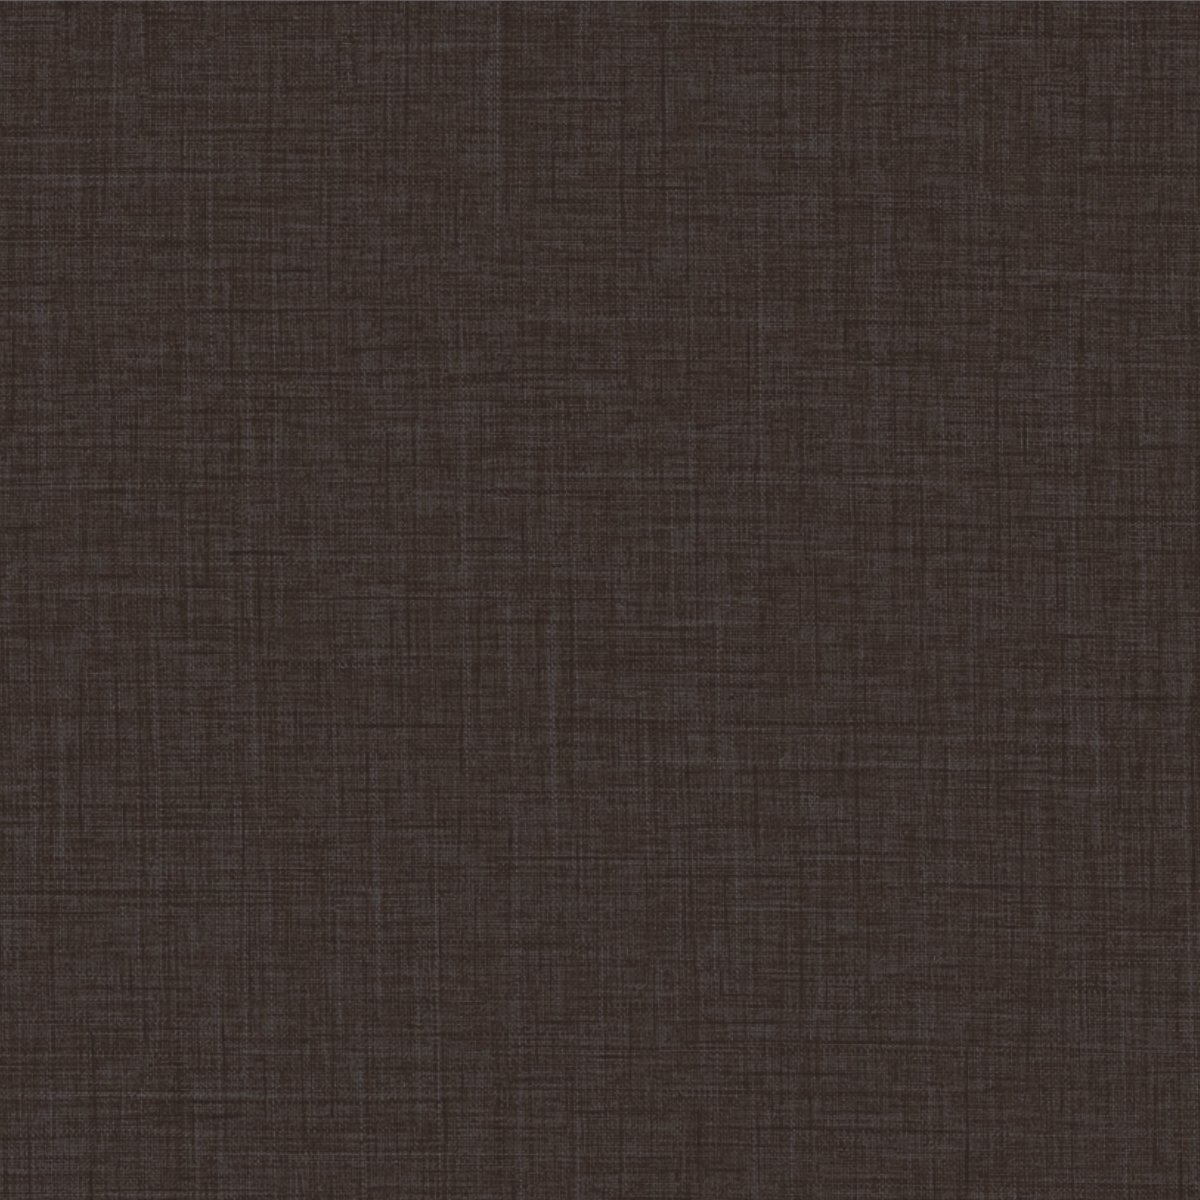 MELAMINA LINO TERRA 18MM 1.83X2.75